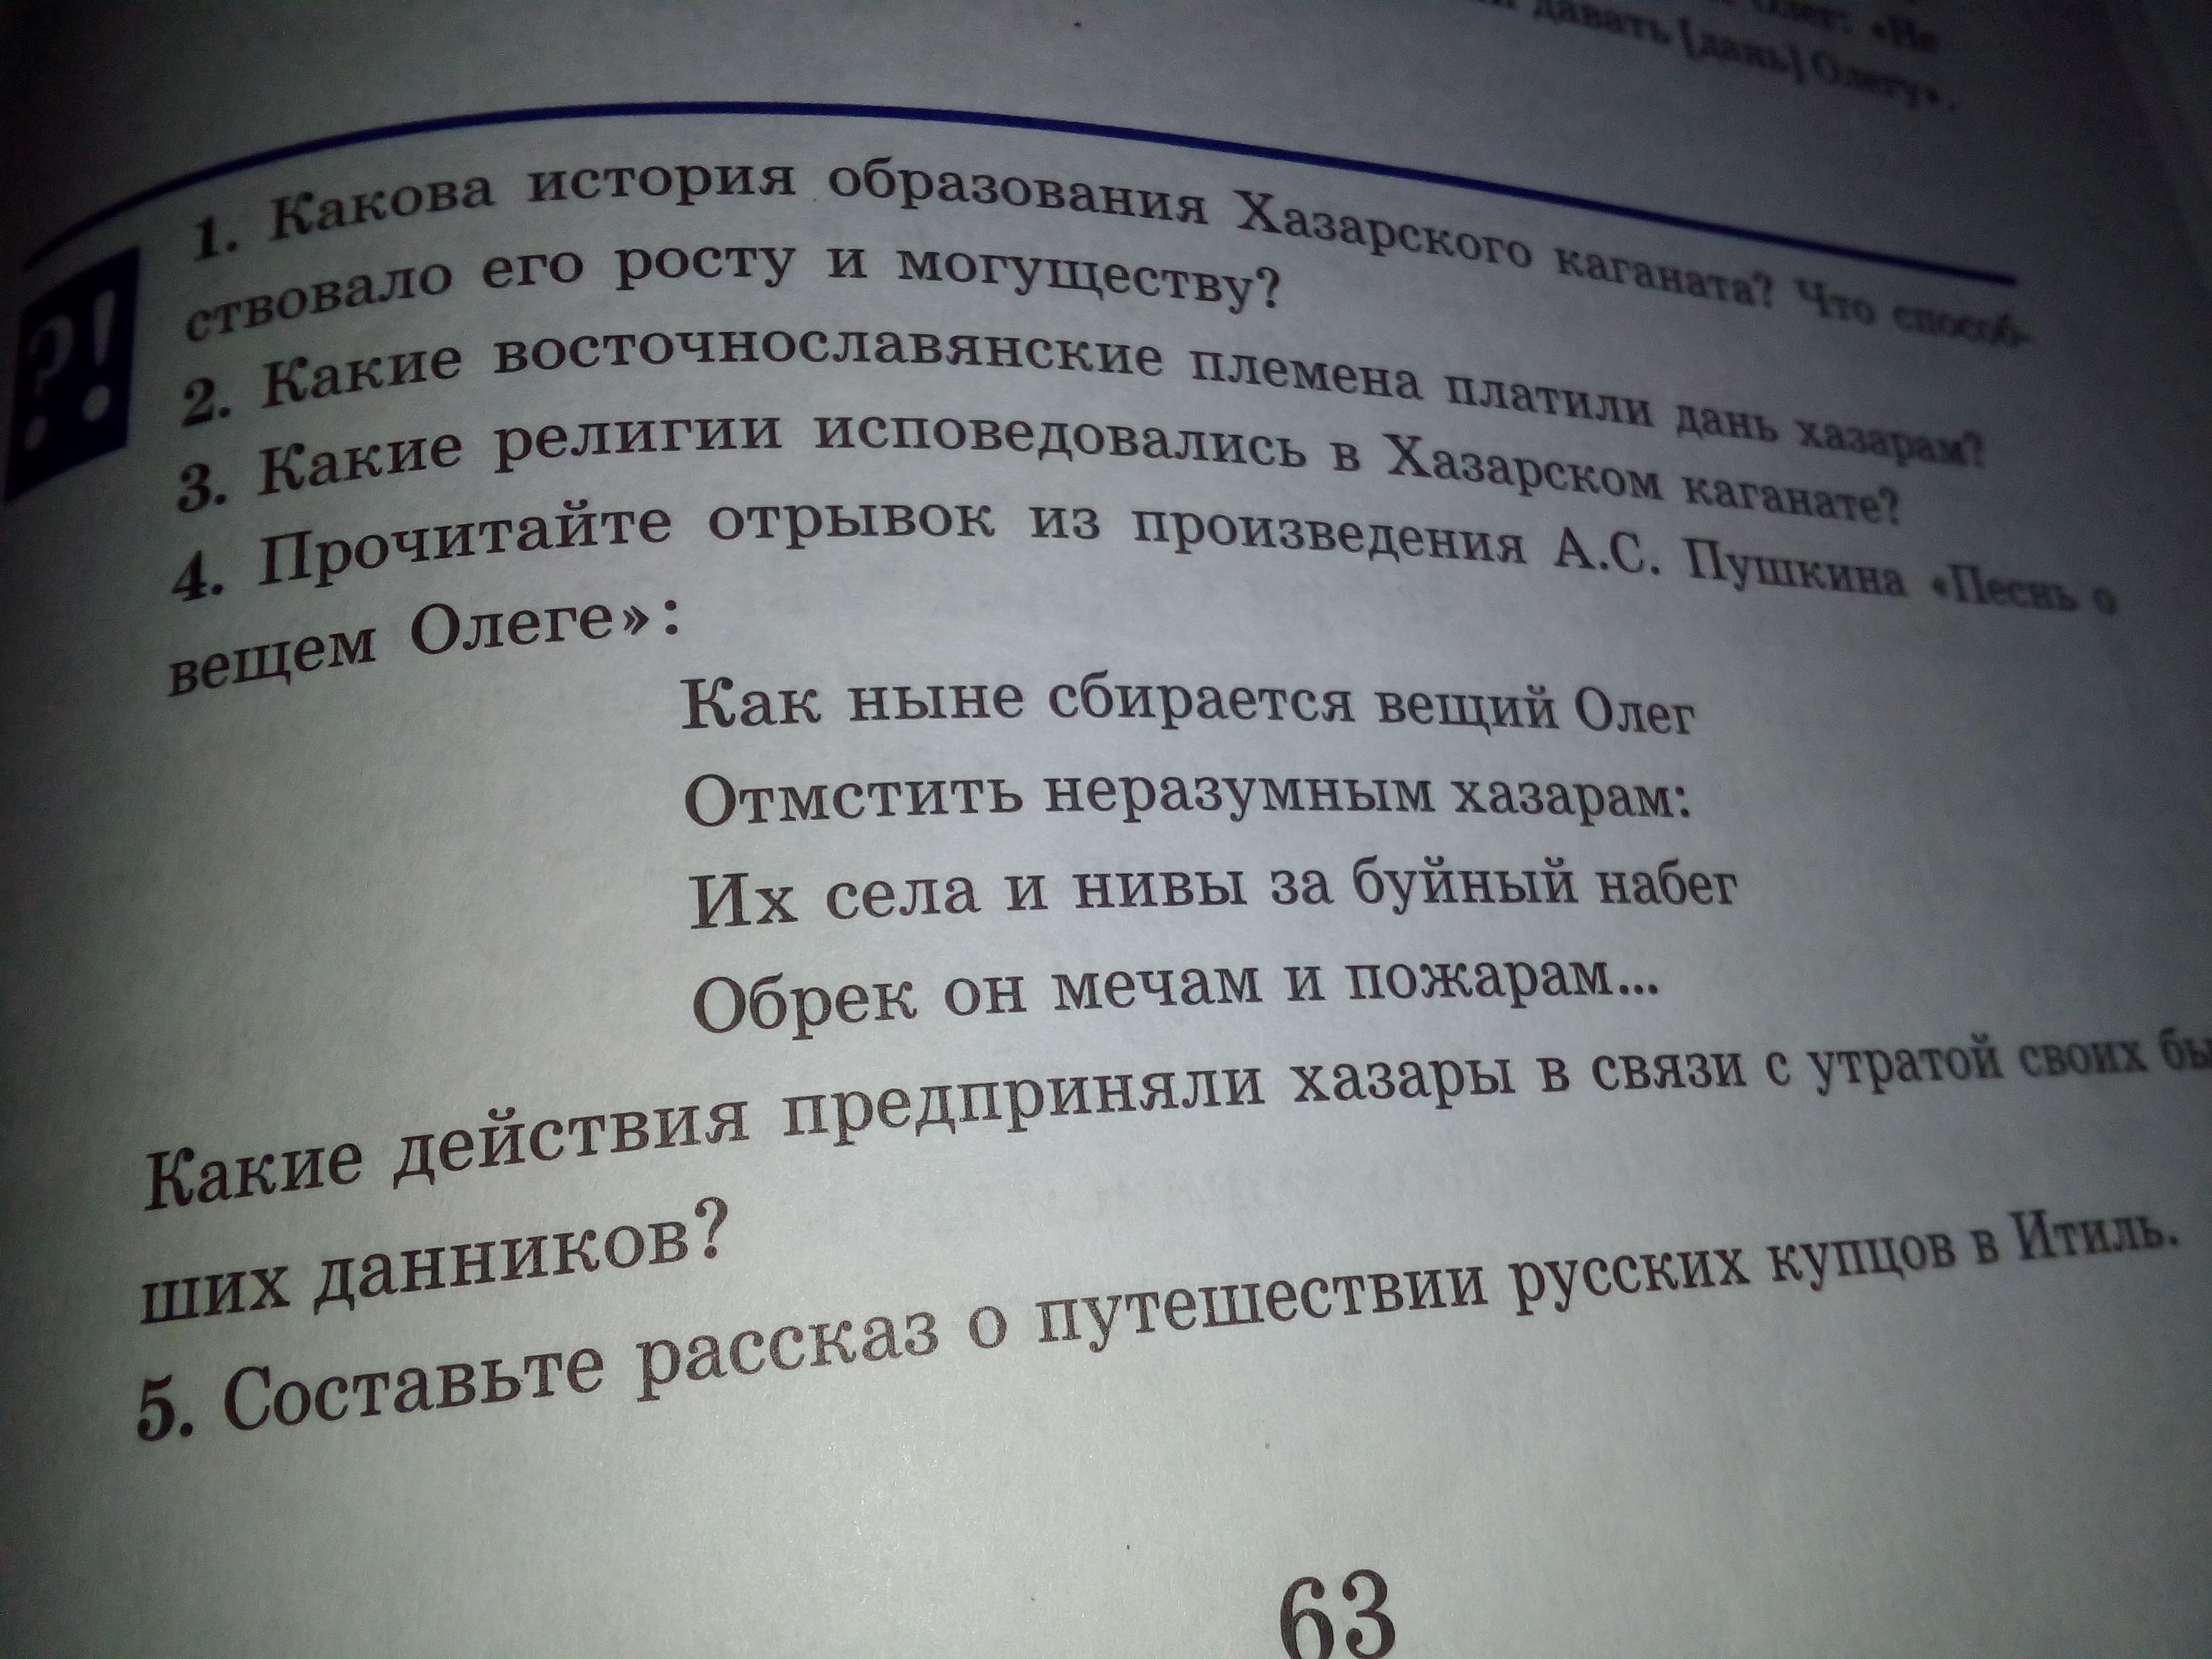 Плиз 4 вопрос помогите?